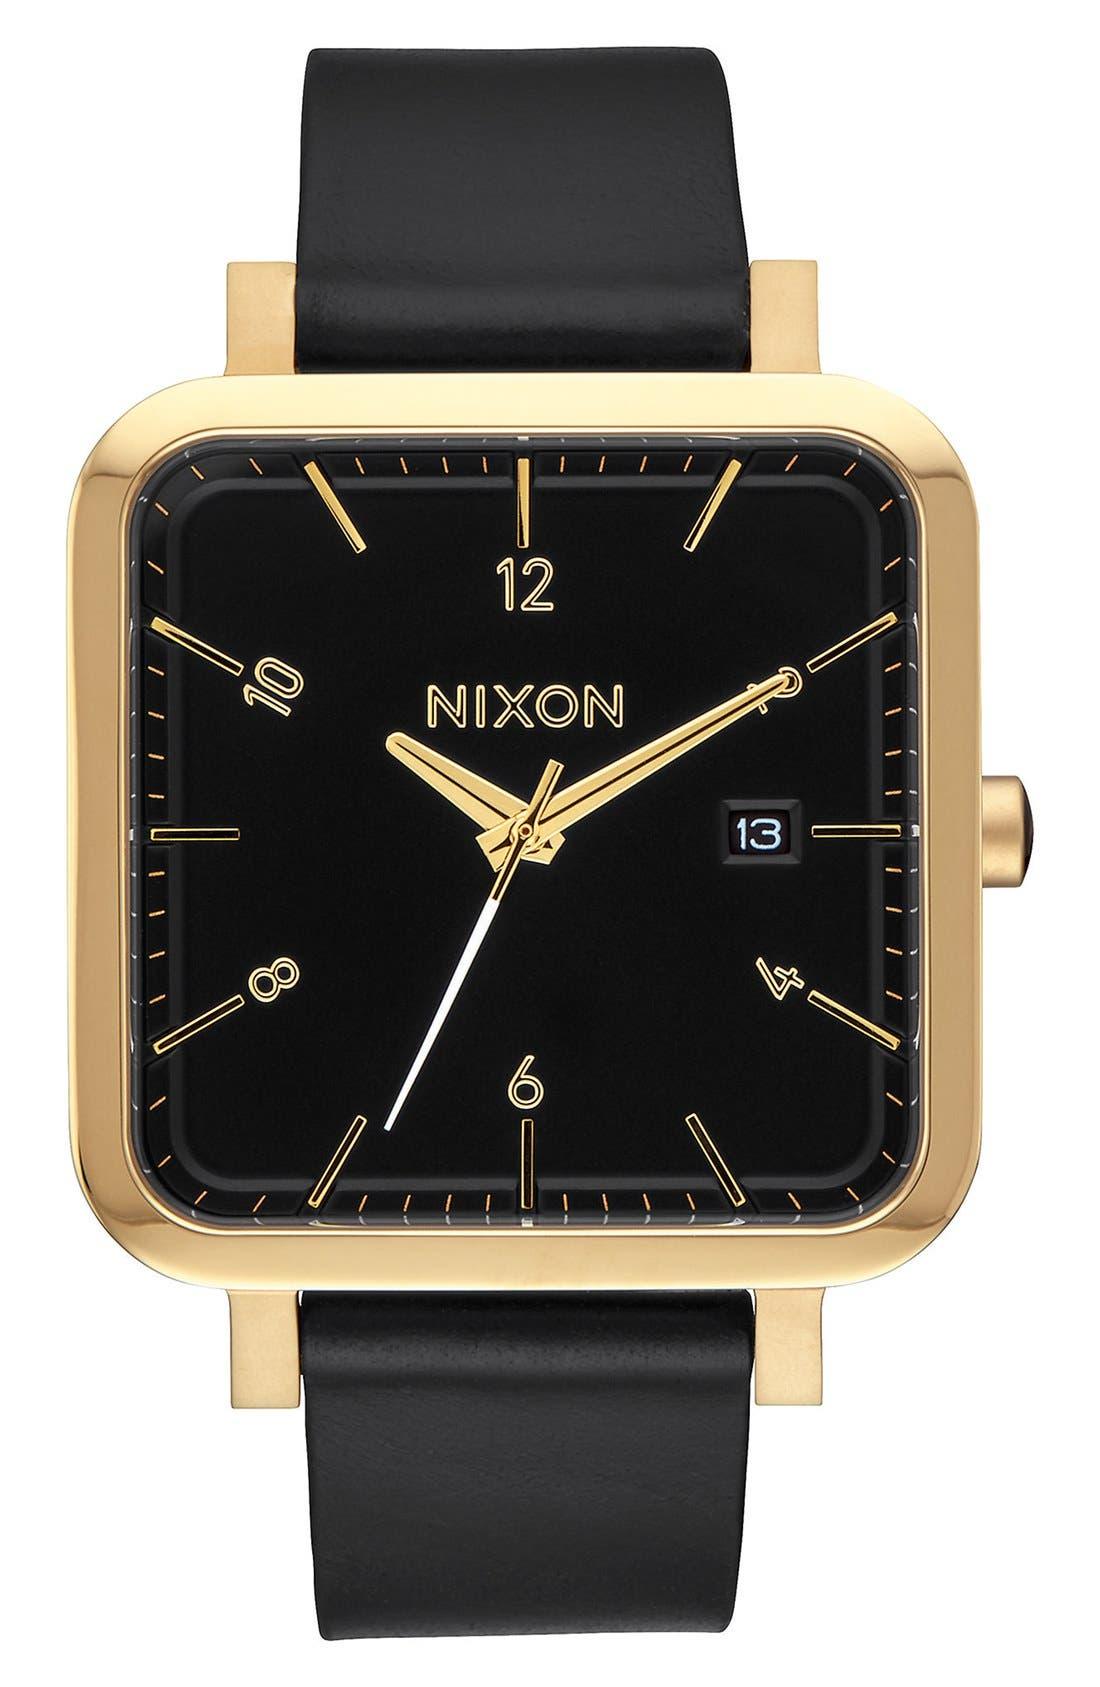 NIXON 'Ragnar' Leather Strap Watch, 36mm, Main, color, 001